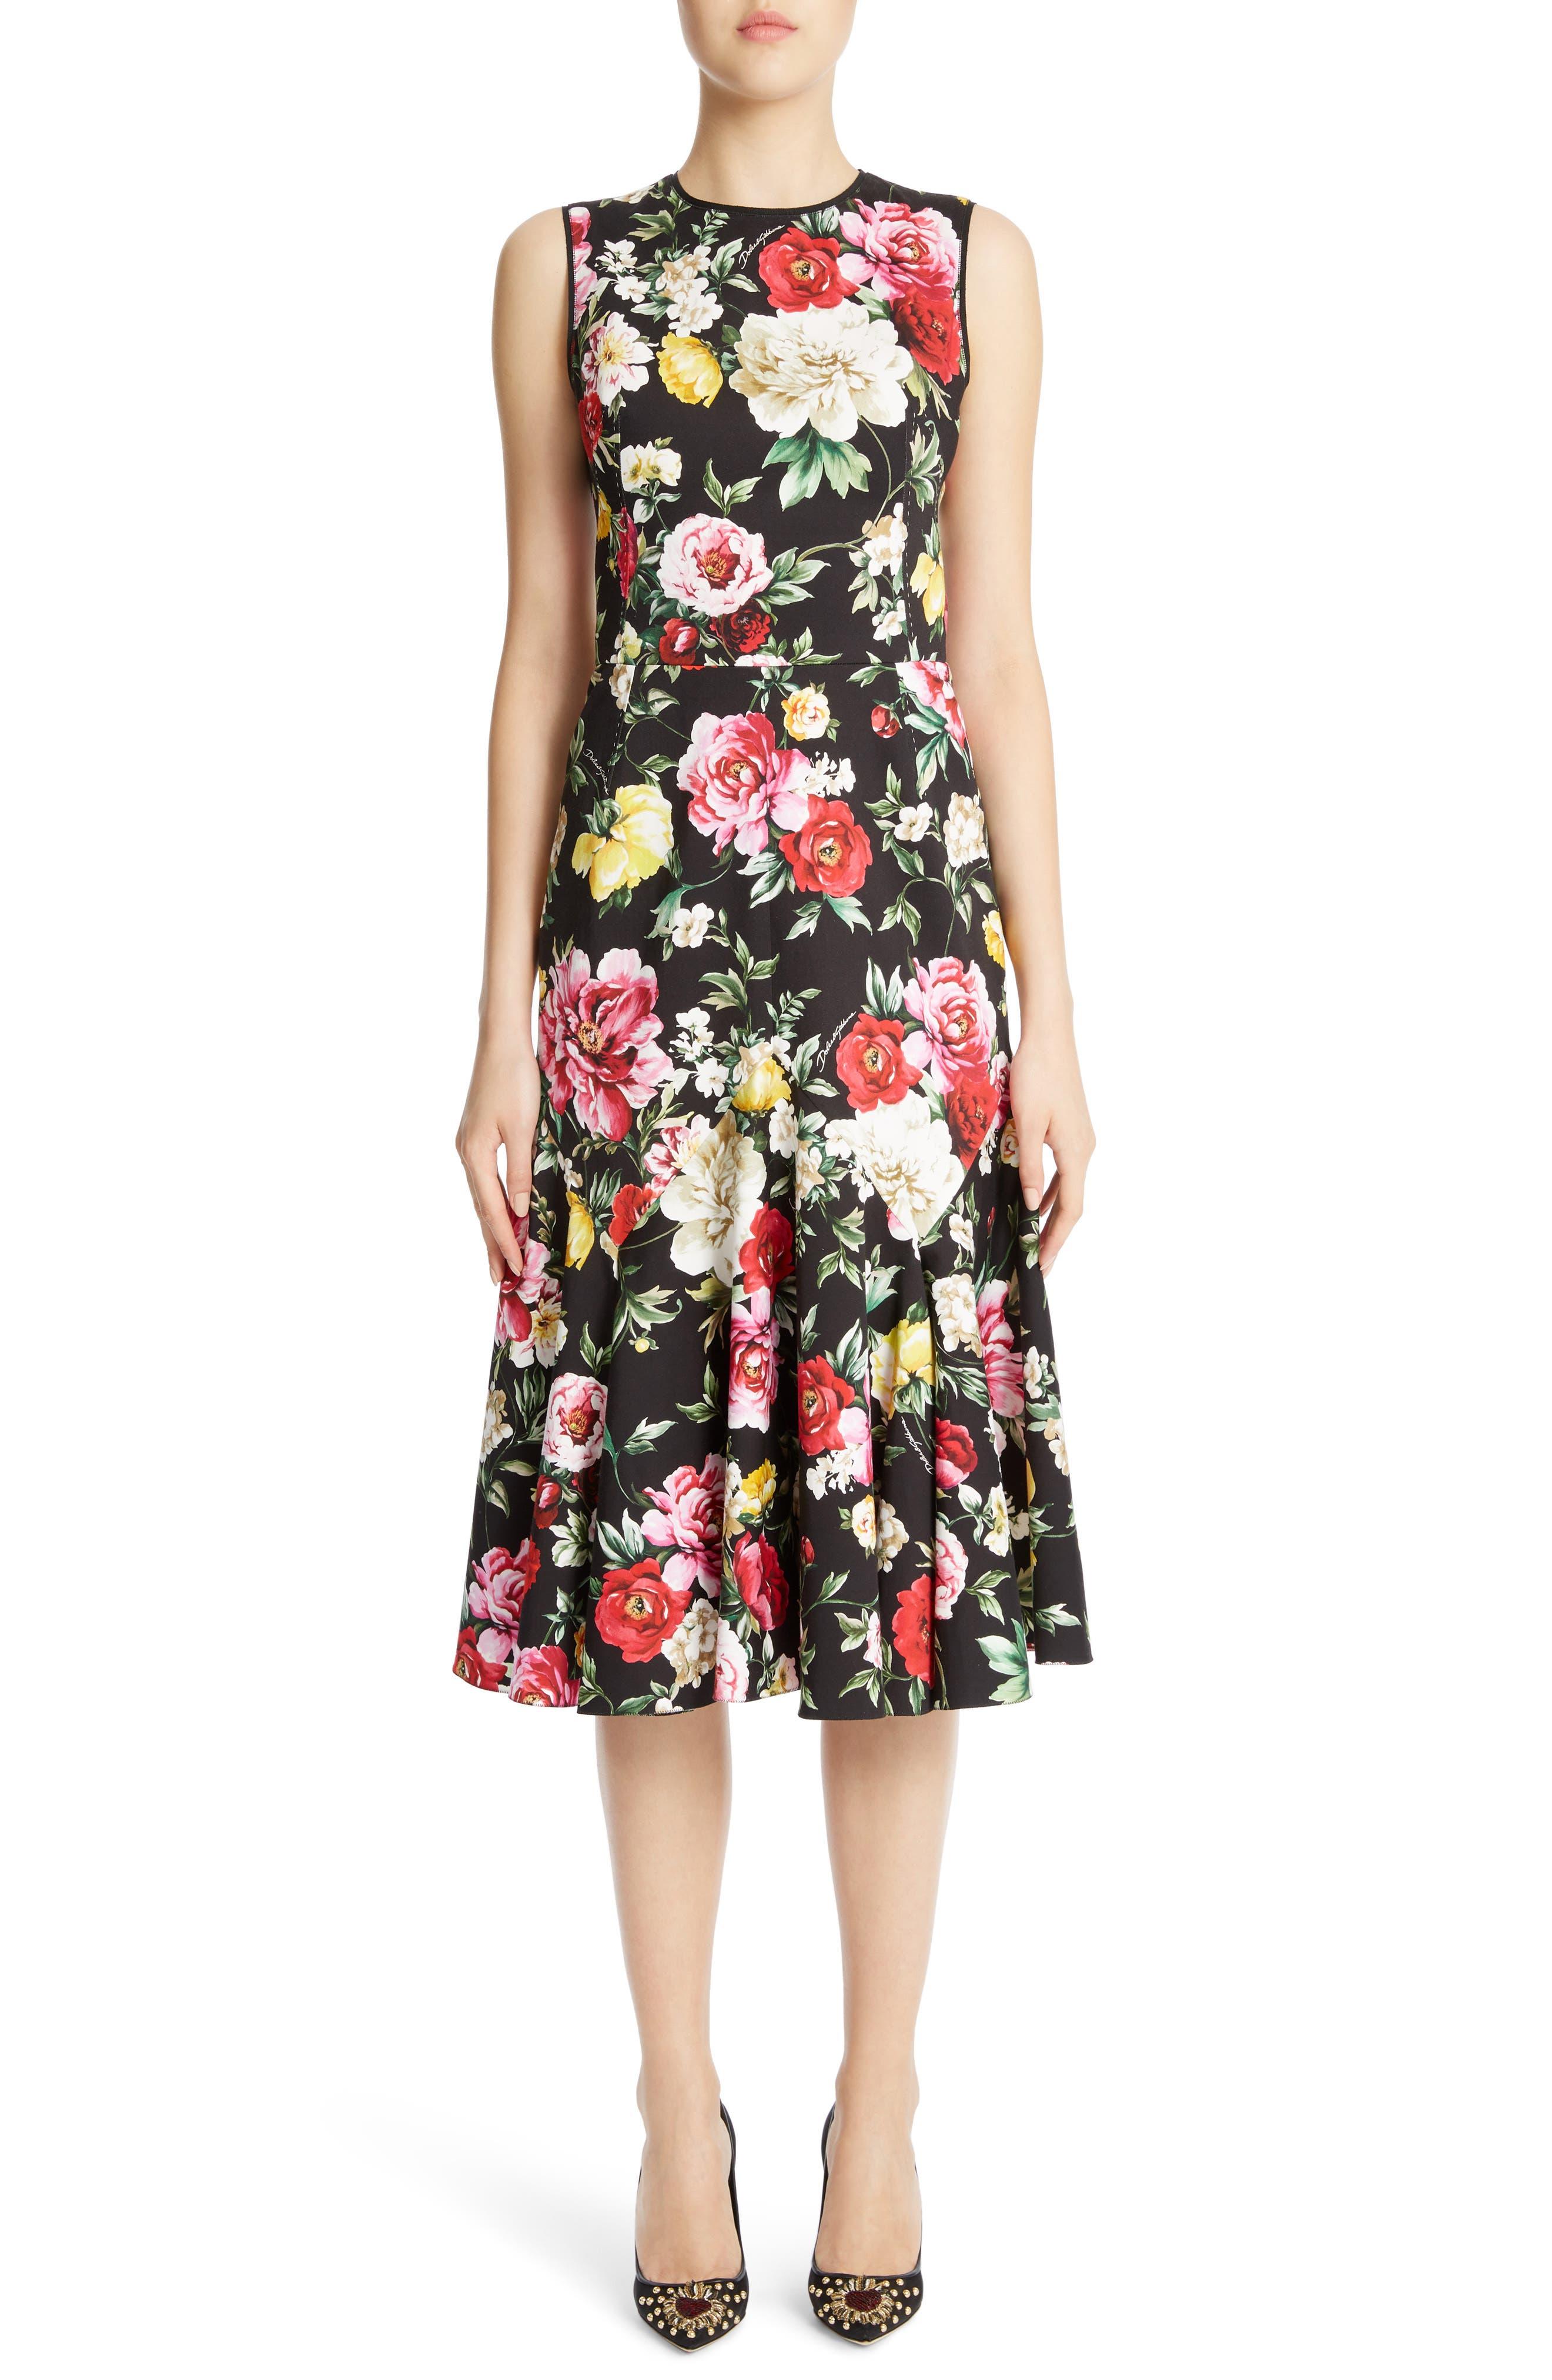 Dolce&Gabbana Floral Print Flare Hem Dress